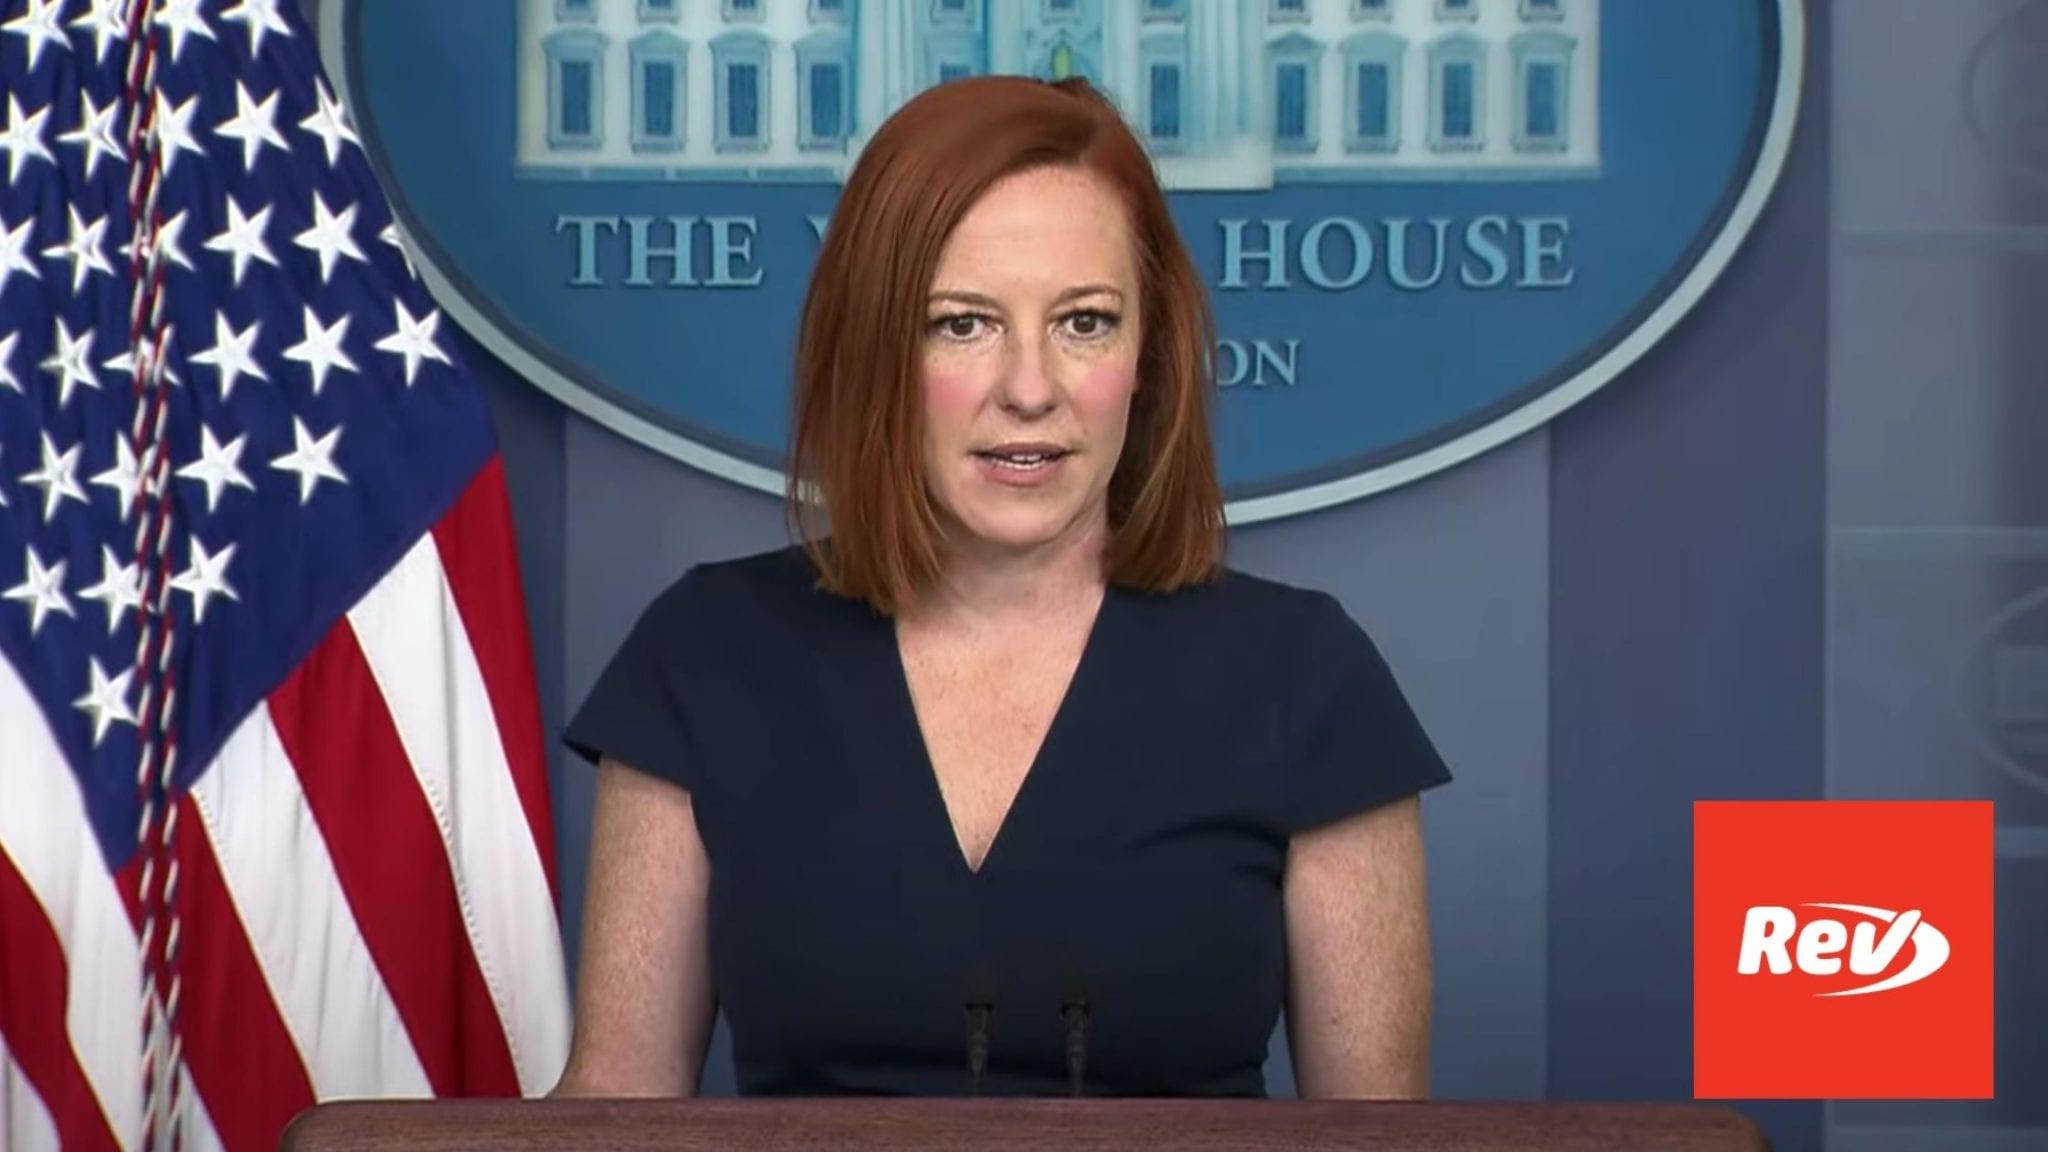 Press Secretary Jen Psaki White House Press Conference Transcript June 8